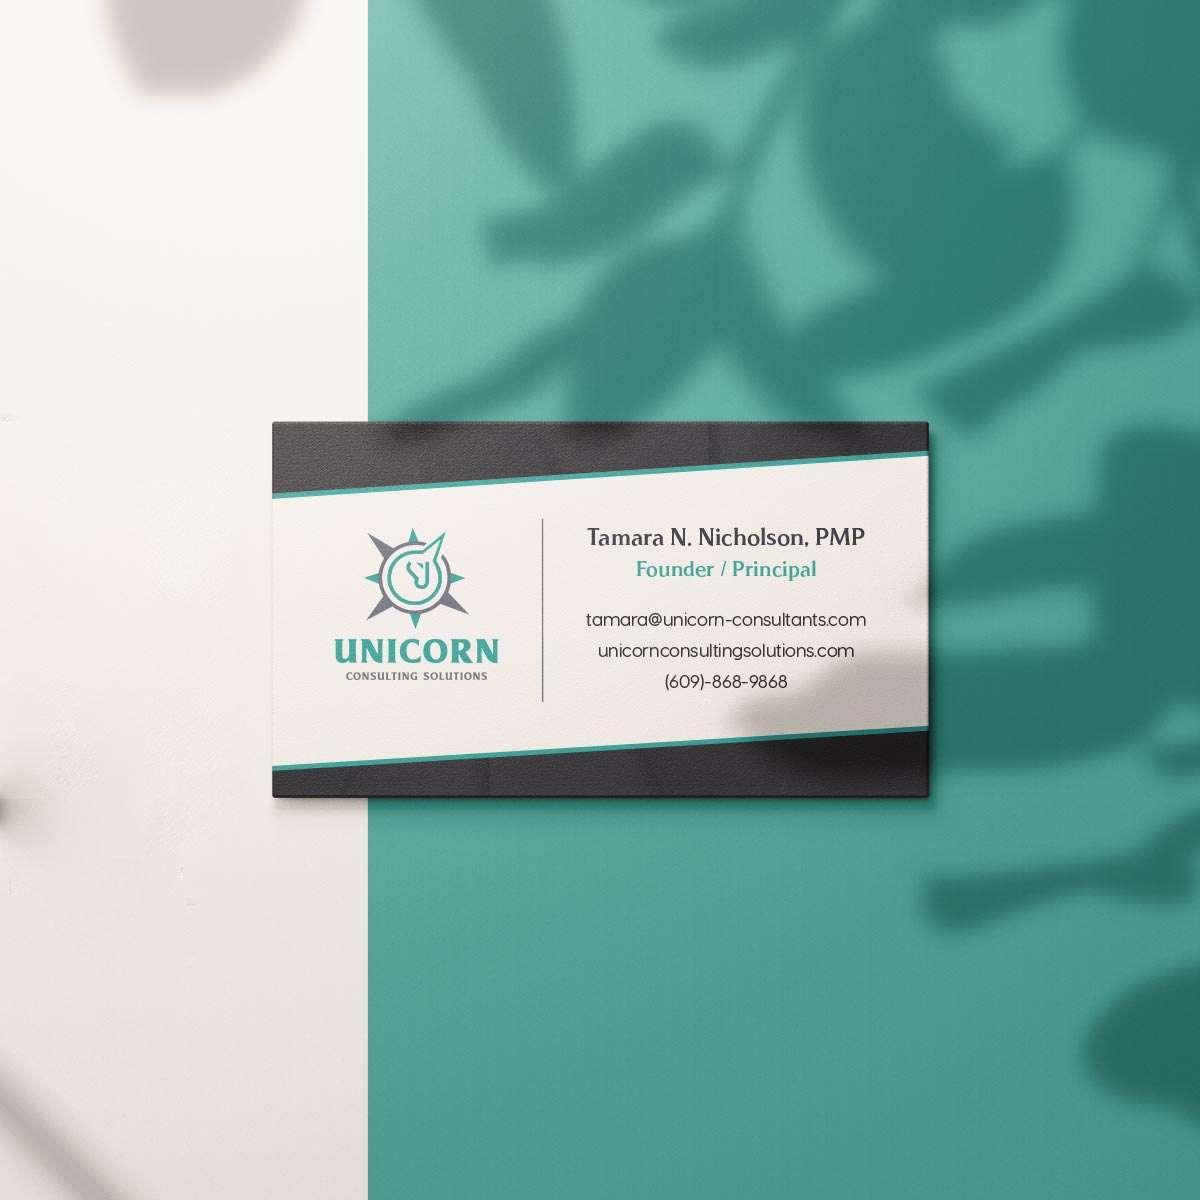 Program management business card by BrandSwan, a Delaware branding agency